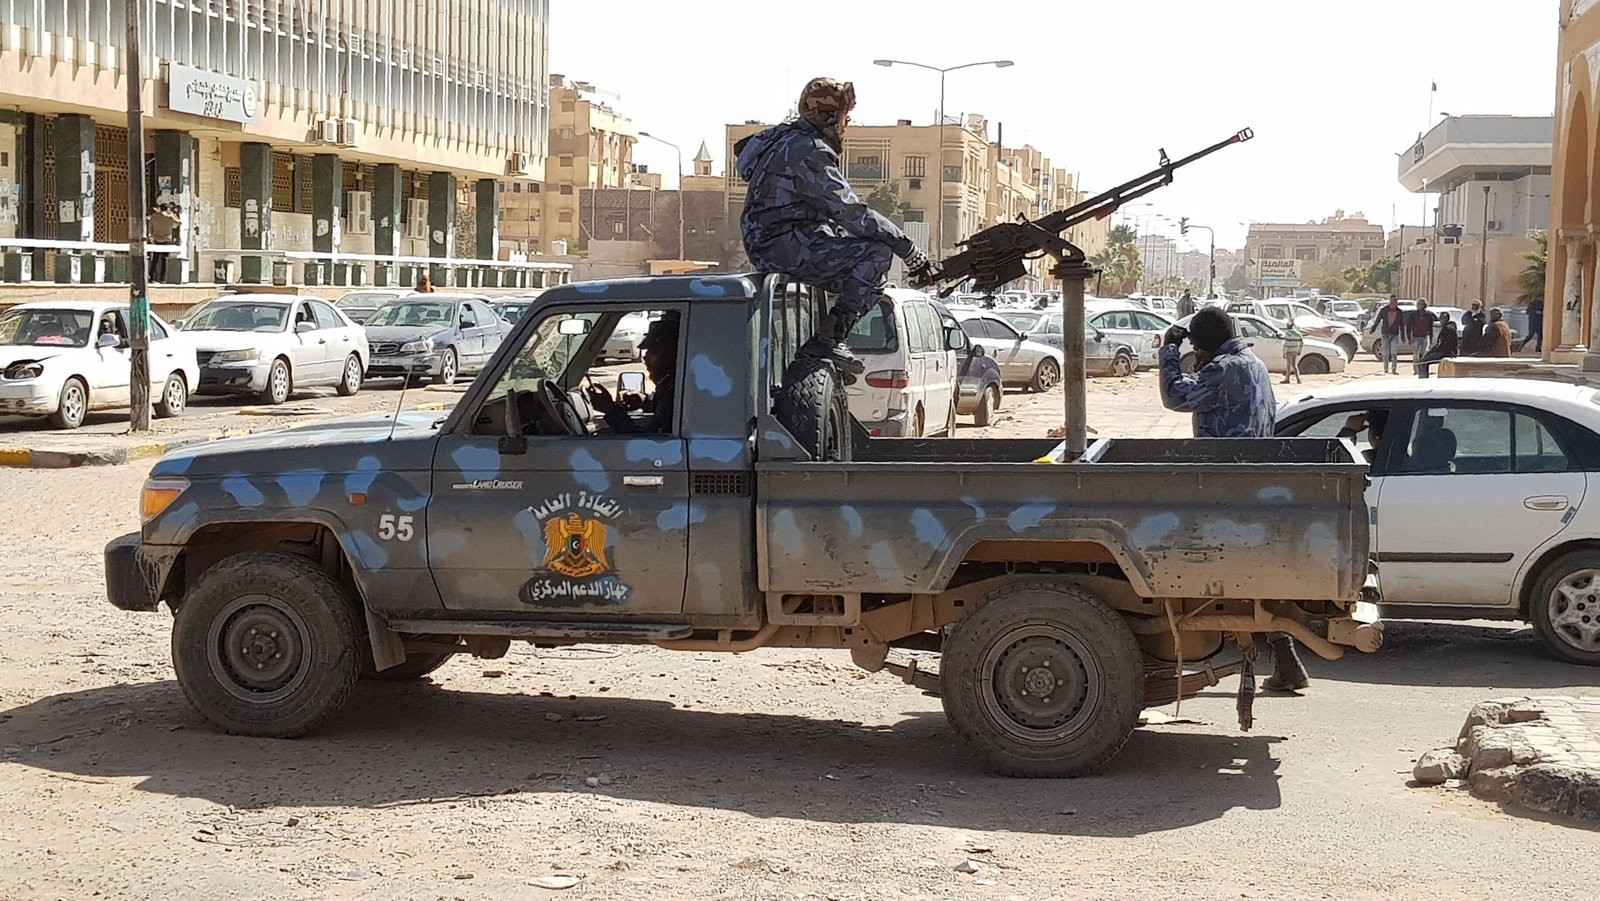 Trump speaks with Libya warlord Haftar